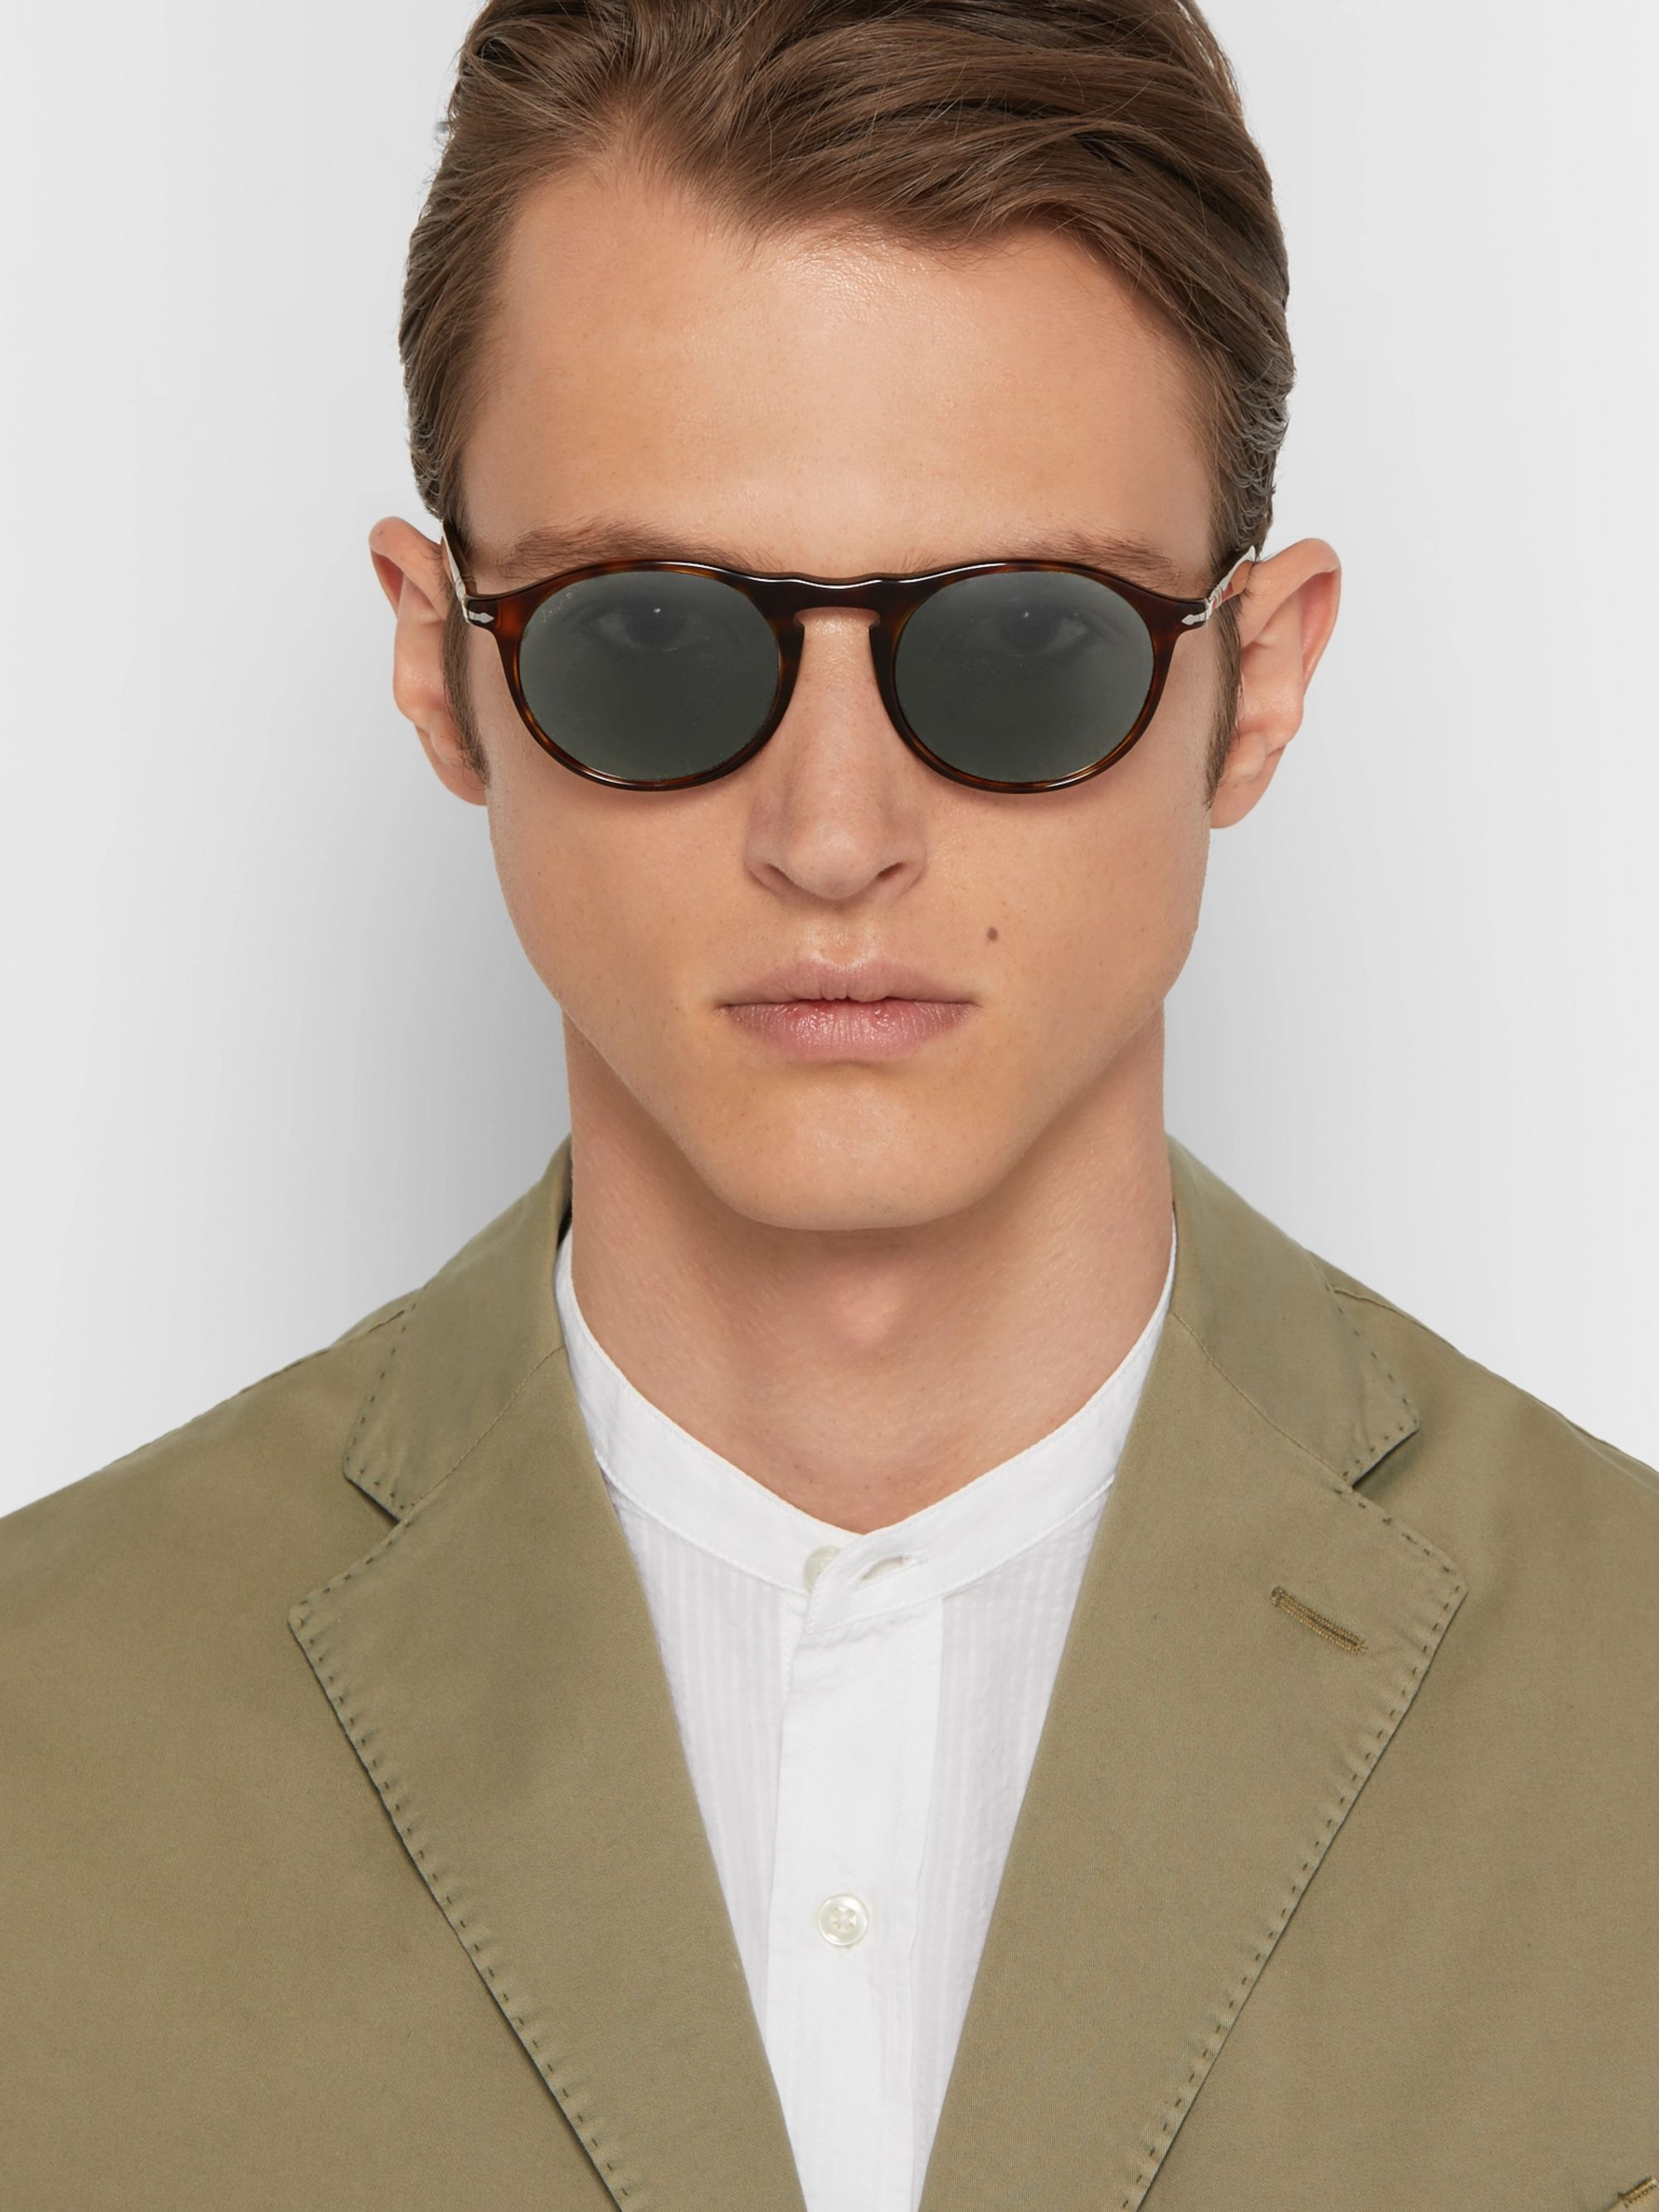 Sunglasses Round Acetate Tortoiseshell Polarised Frame c3ARqLSj45